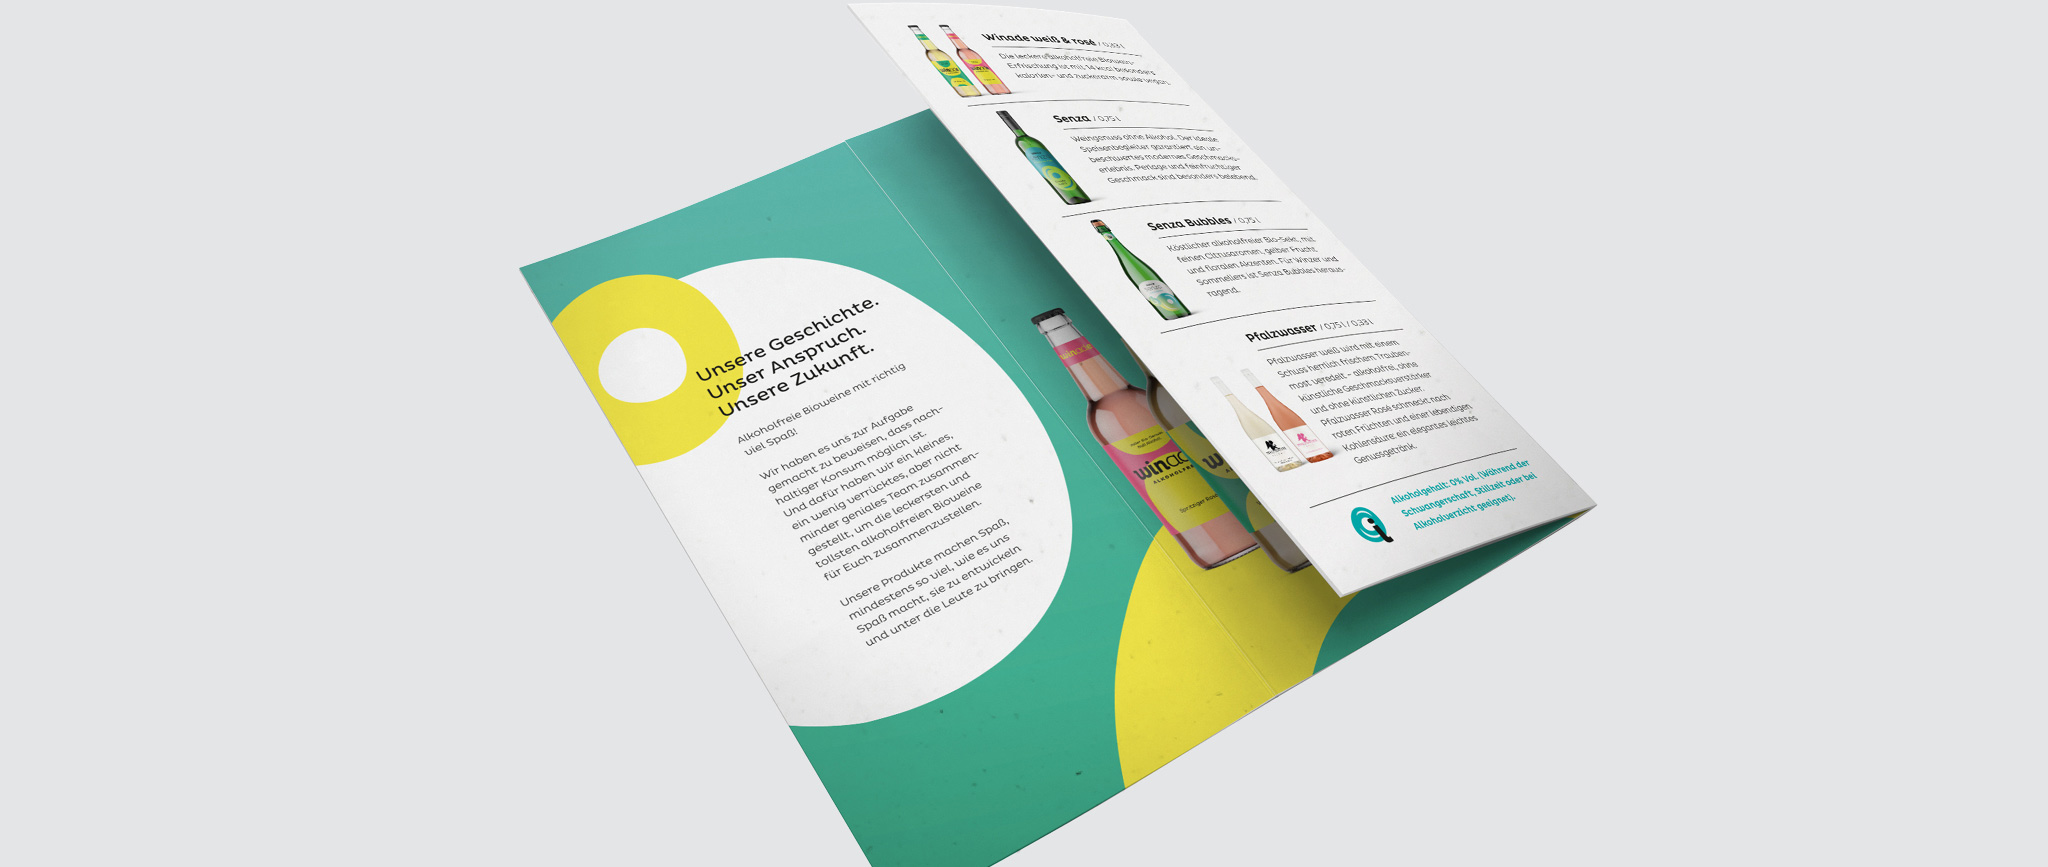 Winade: Flyer Sortiment mit neuem Corporate Design